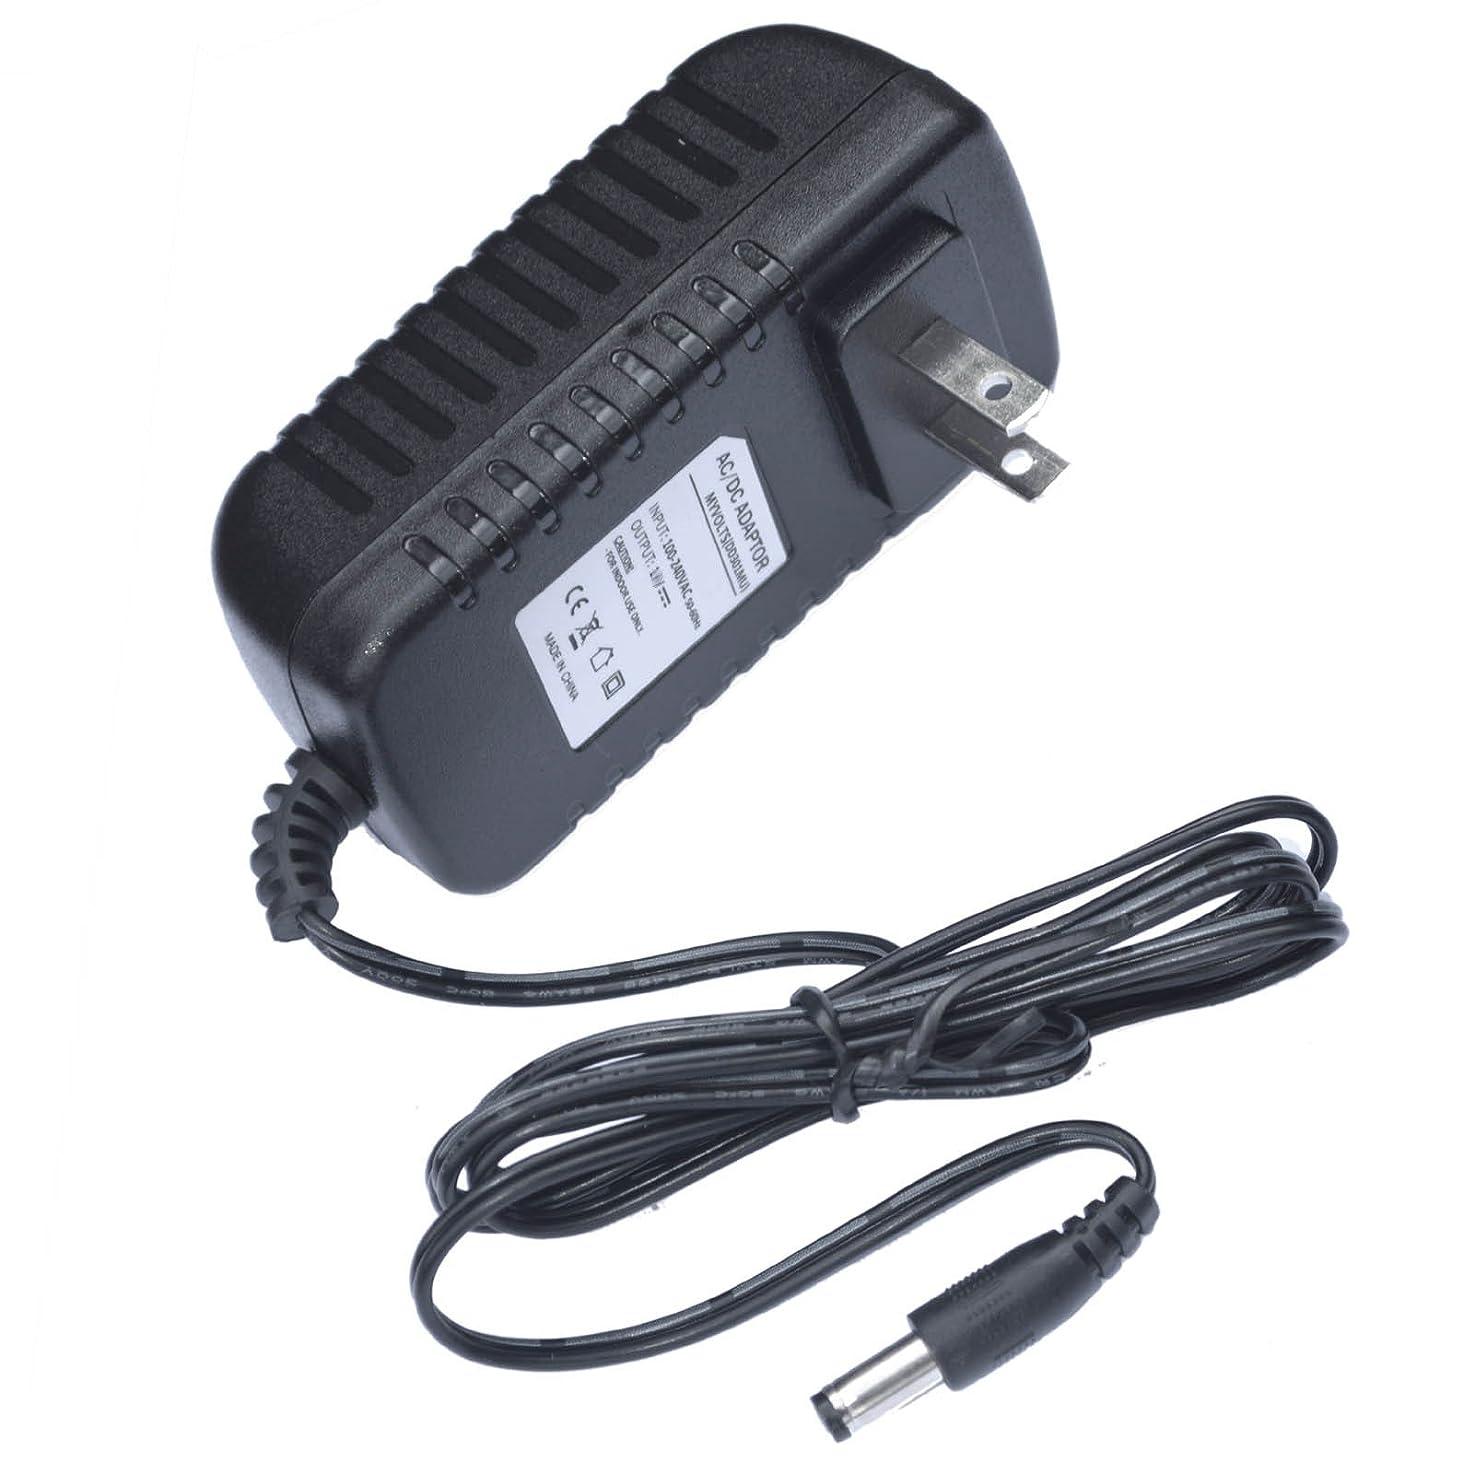 MyVolts 5V Power Supply Adaptor Compatible with Pioneer DDJ-SX2 DJ System - US Plug